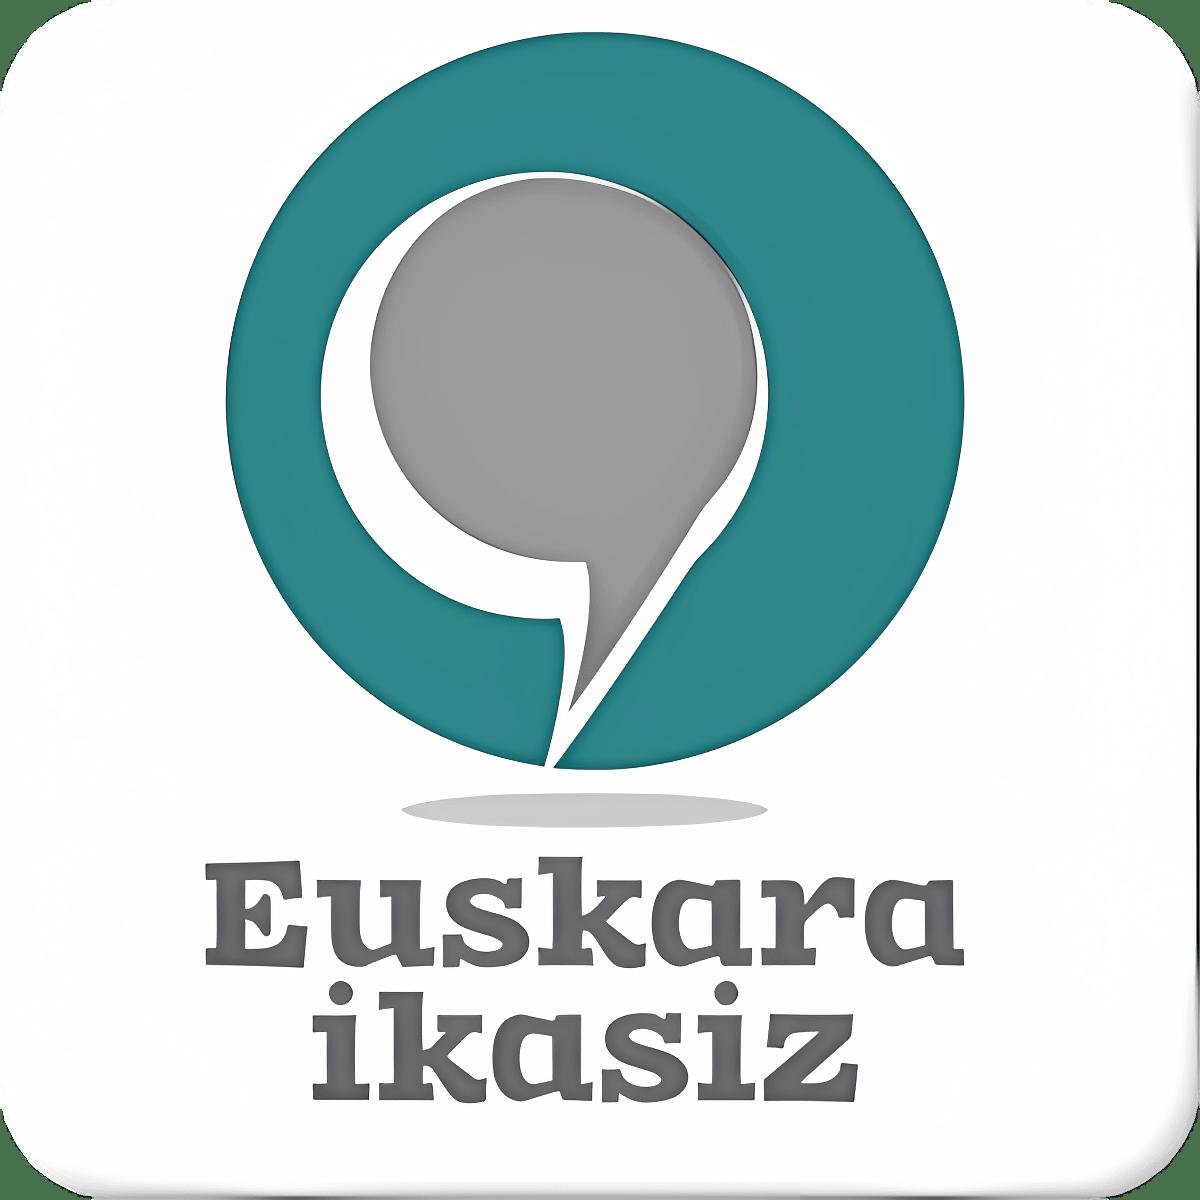 Euskara ikasiz 1.maila 2.0